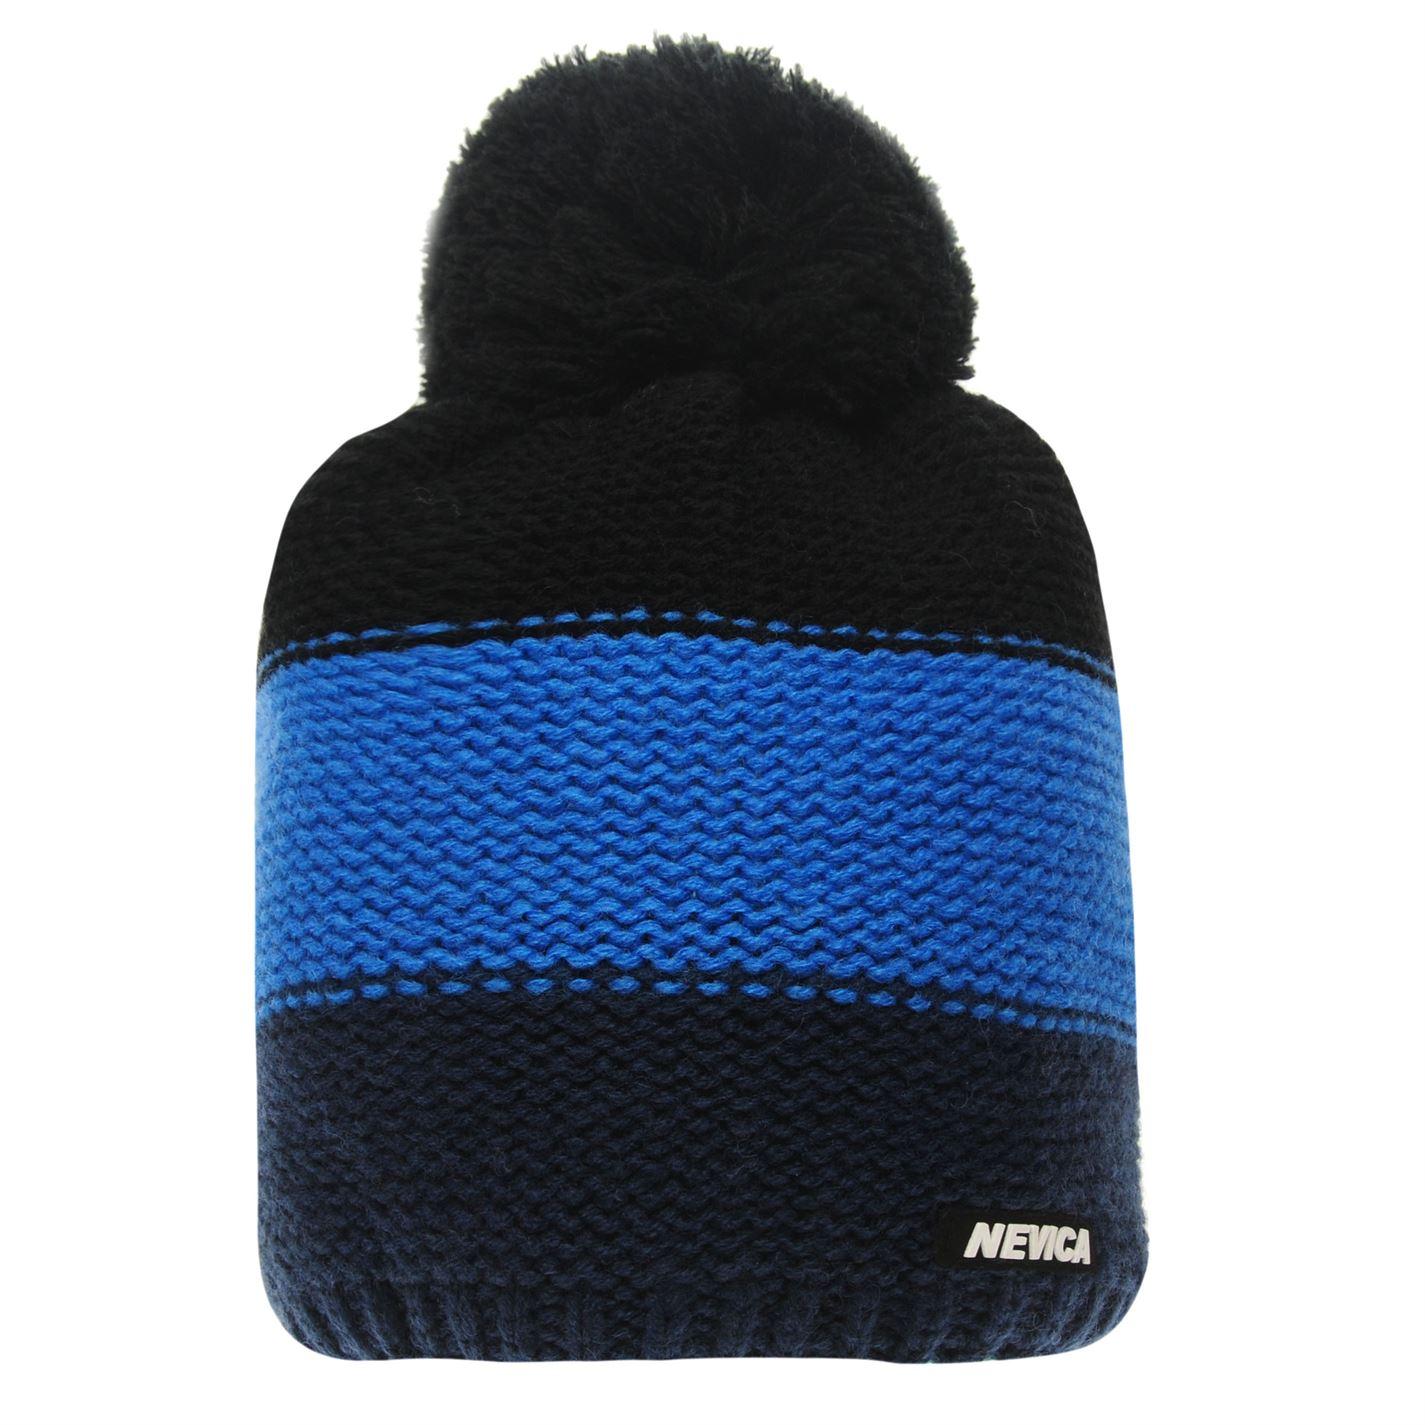 7208848016c Nevica Banff Beanie Hat Mens Gents Ski Warm Stretch